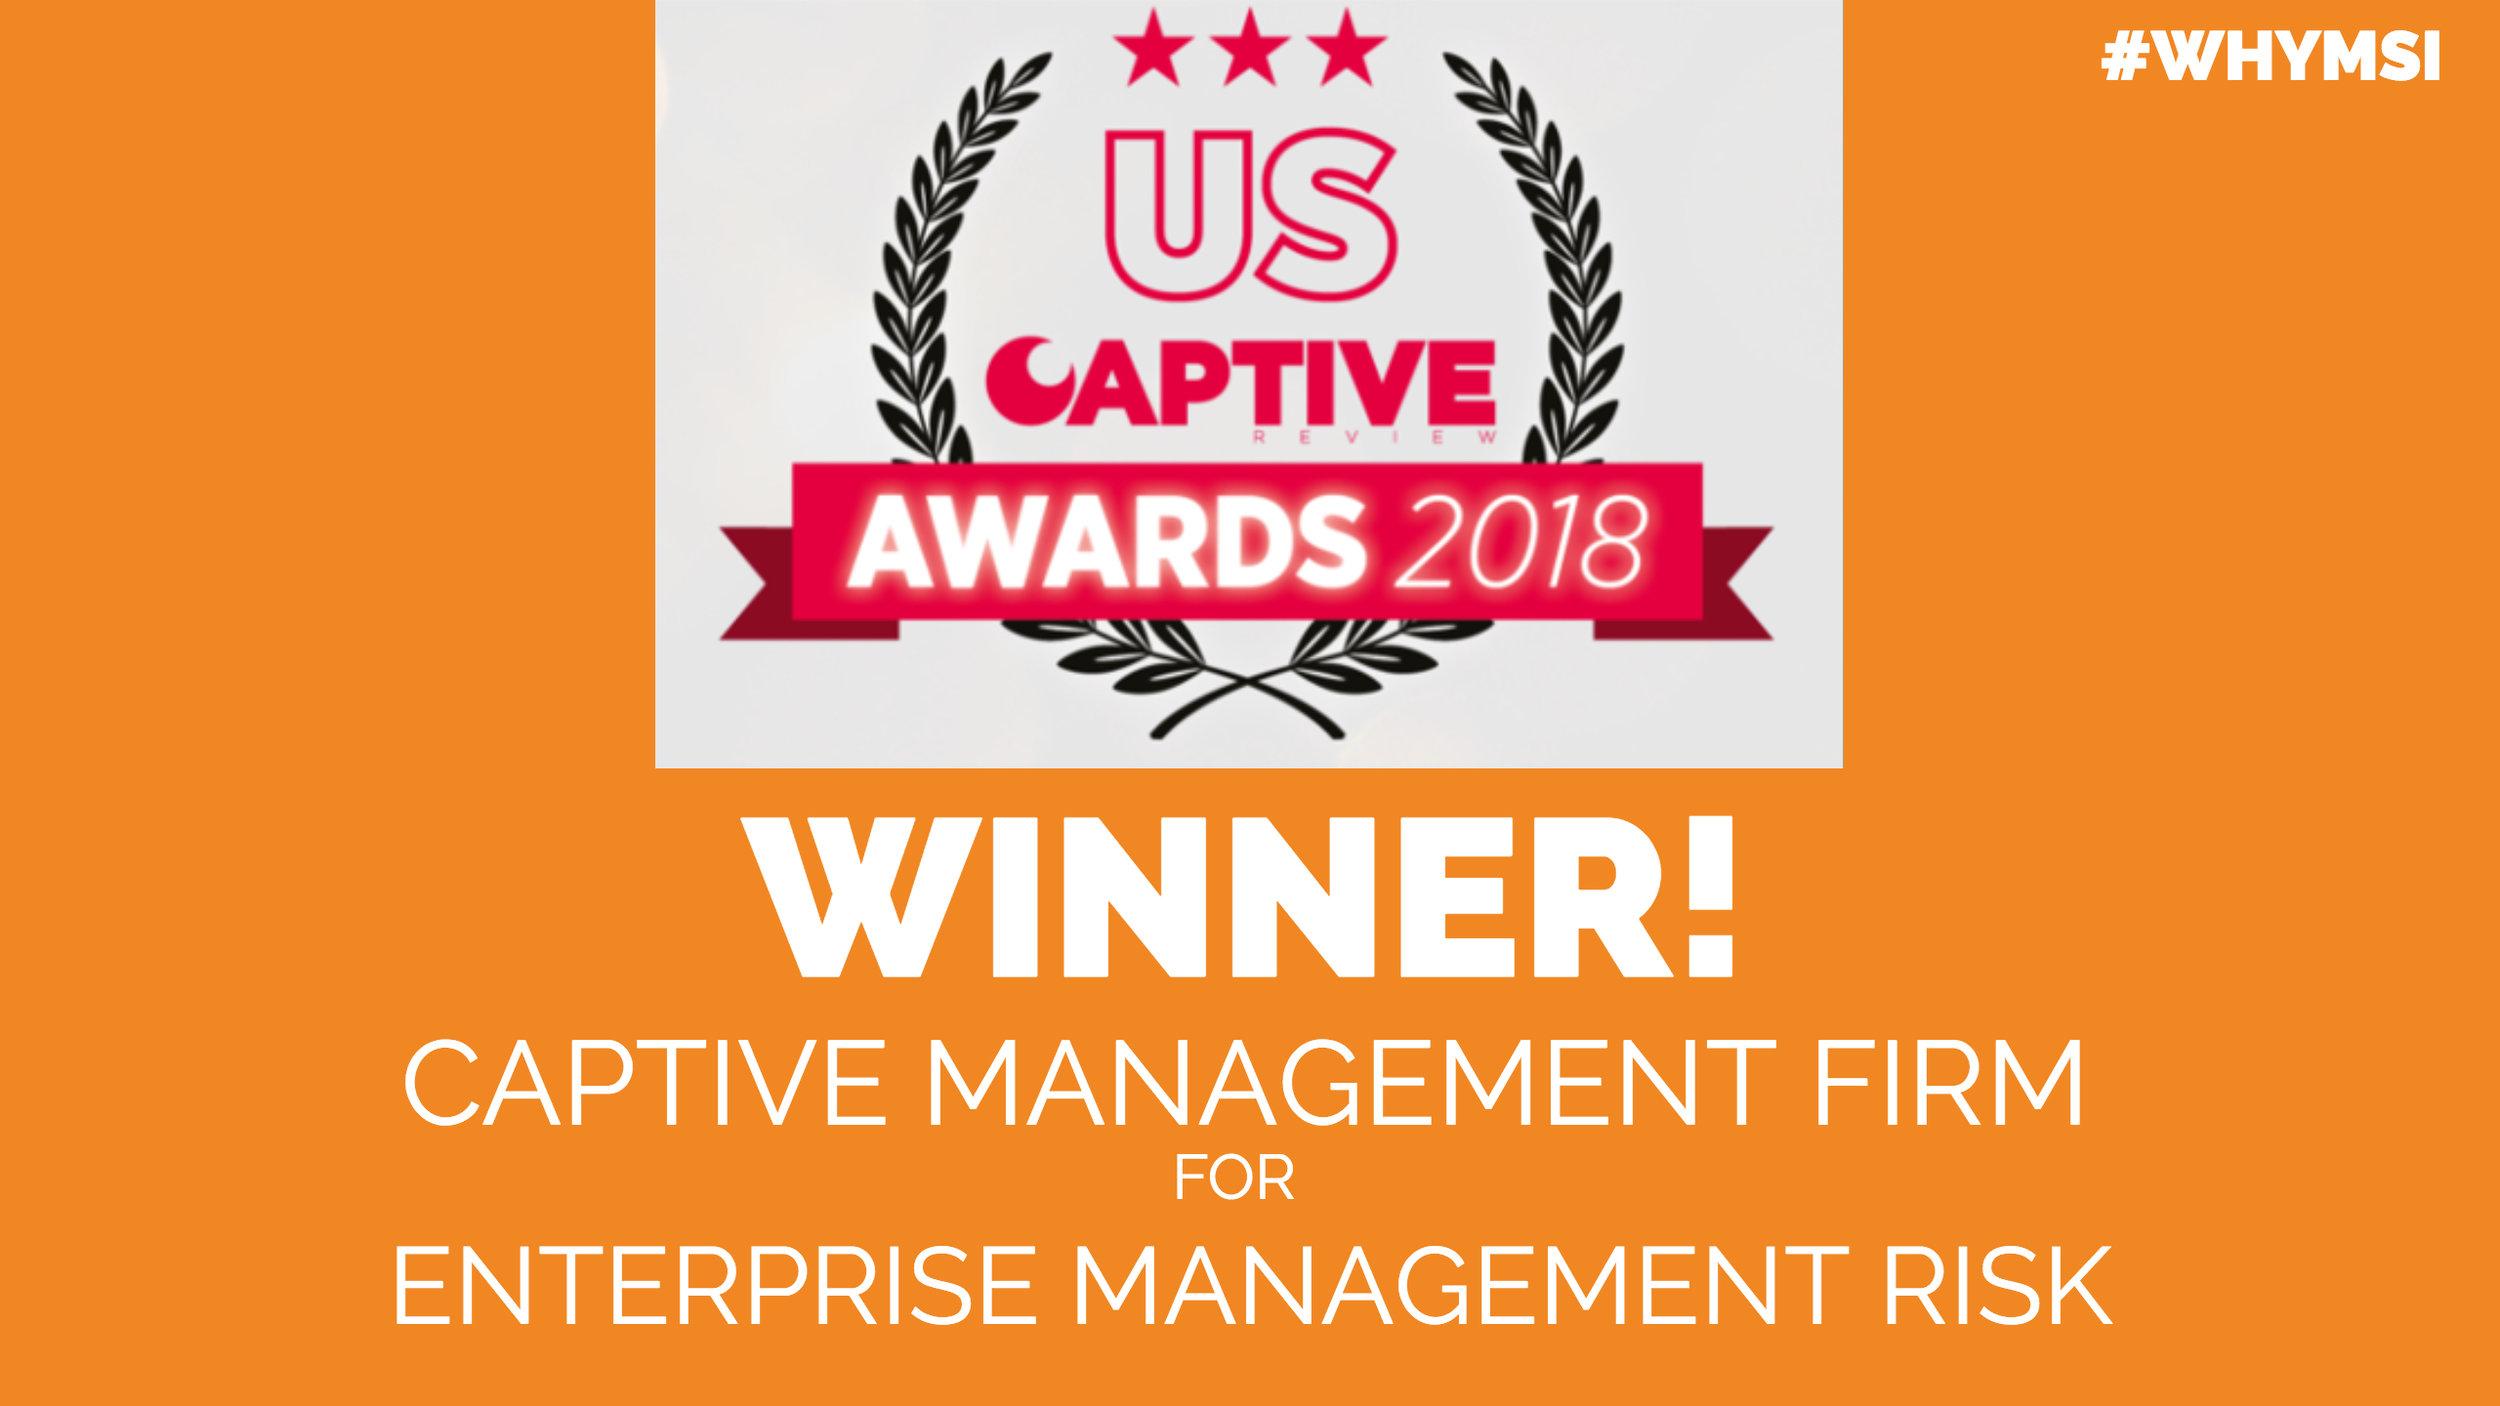 MSI US Captive Awards 2018 Winner for top captive insurance firm for enterprise management risk.jpeg